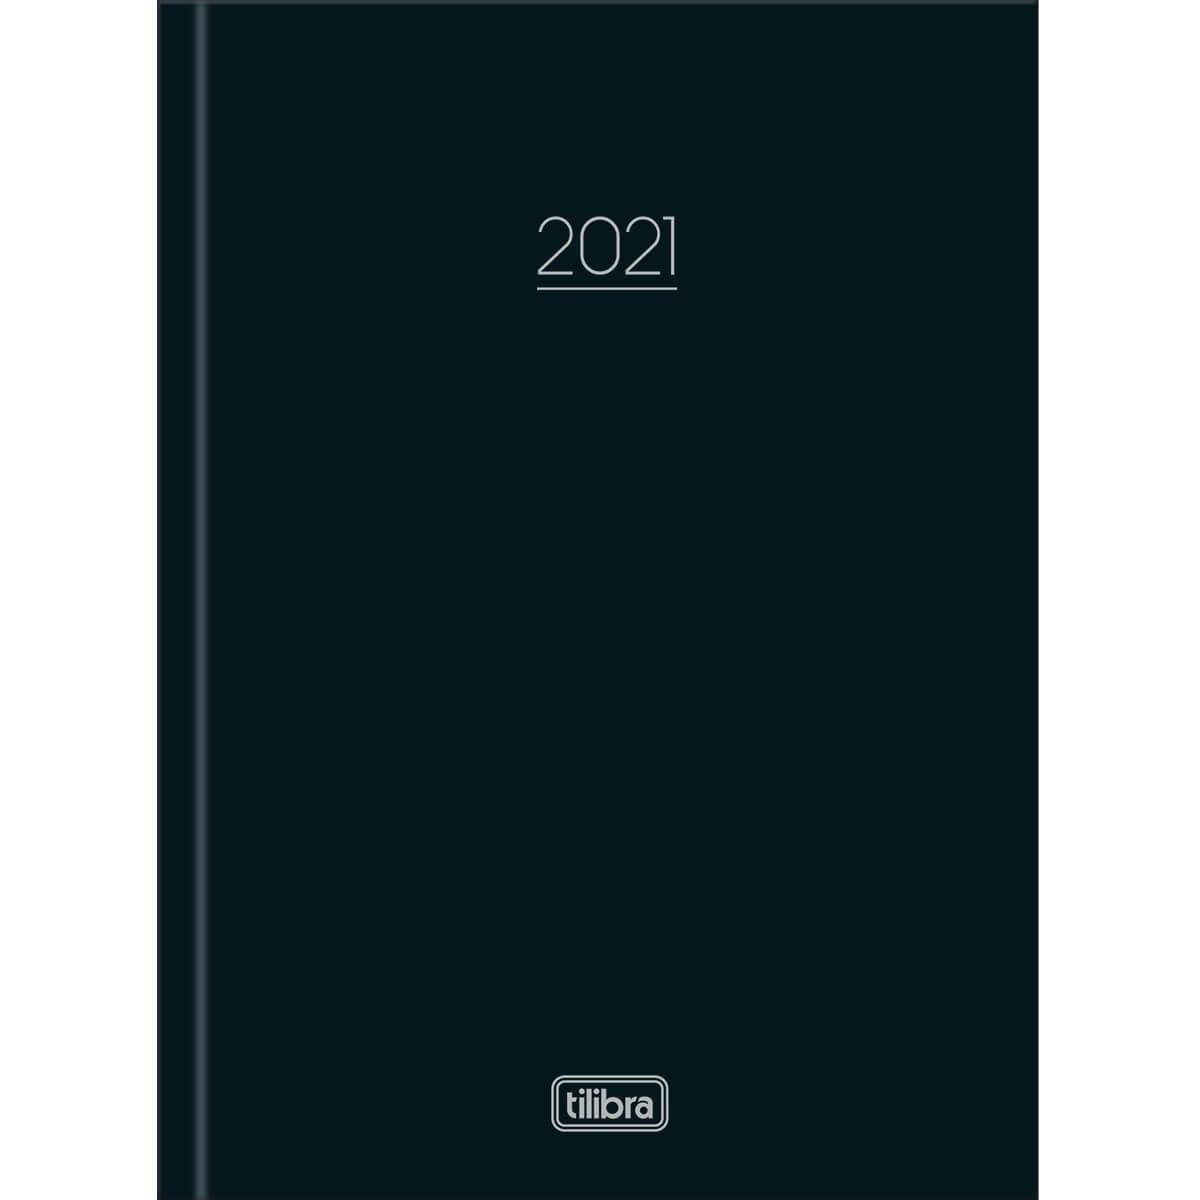 Agenda Costurado Preta 2021 Pepper M4 Tilibra